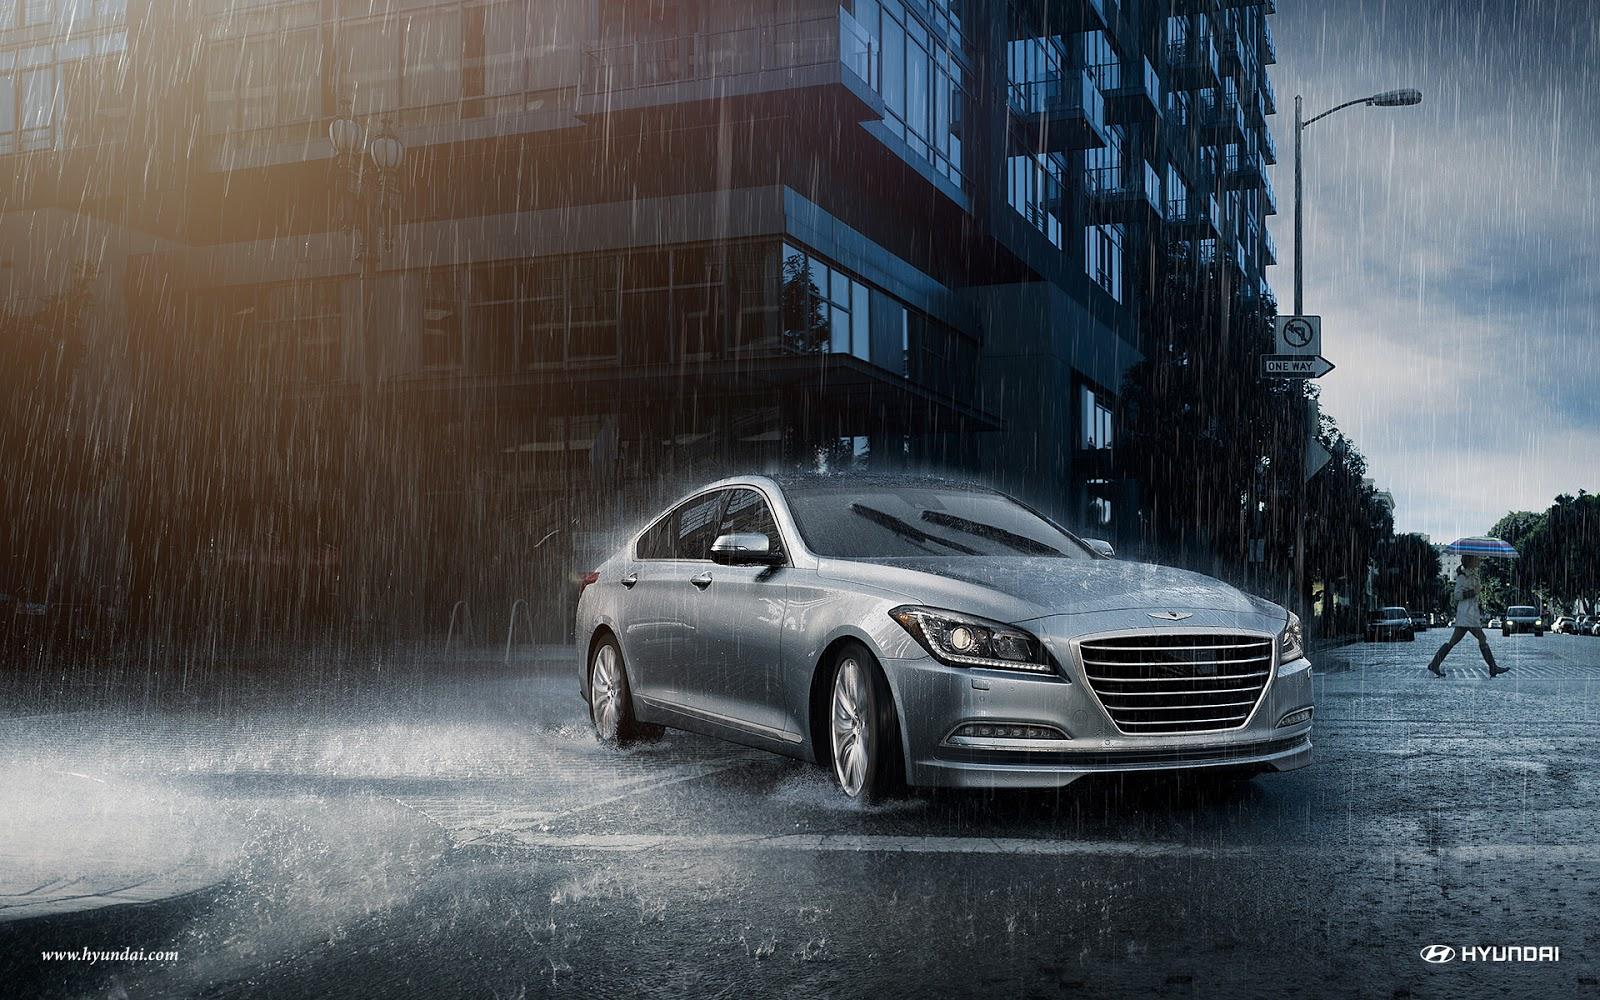 Hyundai Has A Luxury Brand Its Name Is Genesis